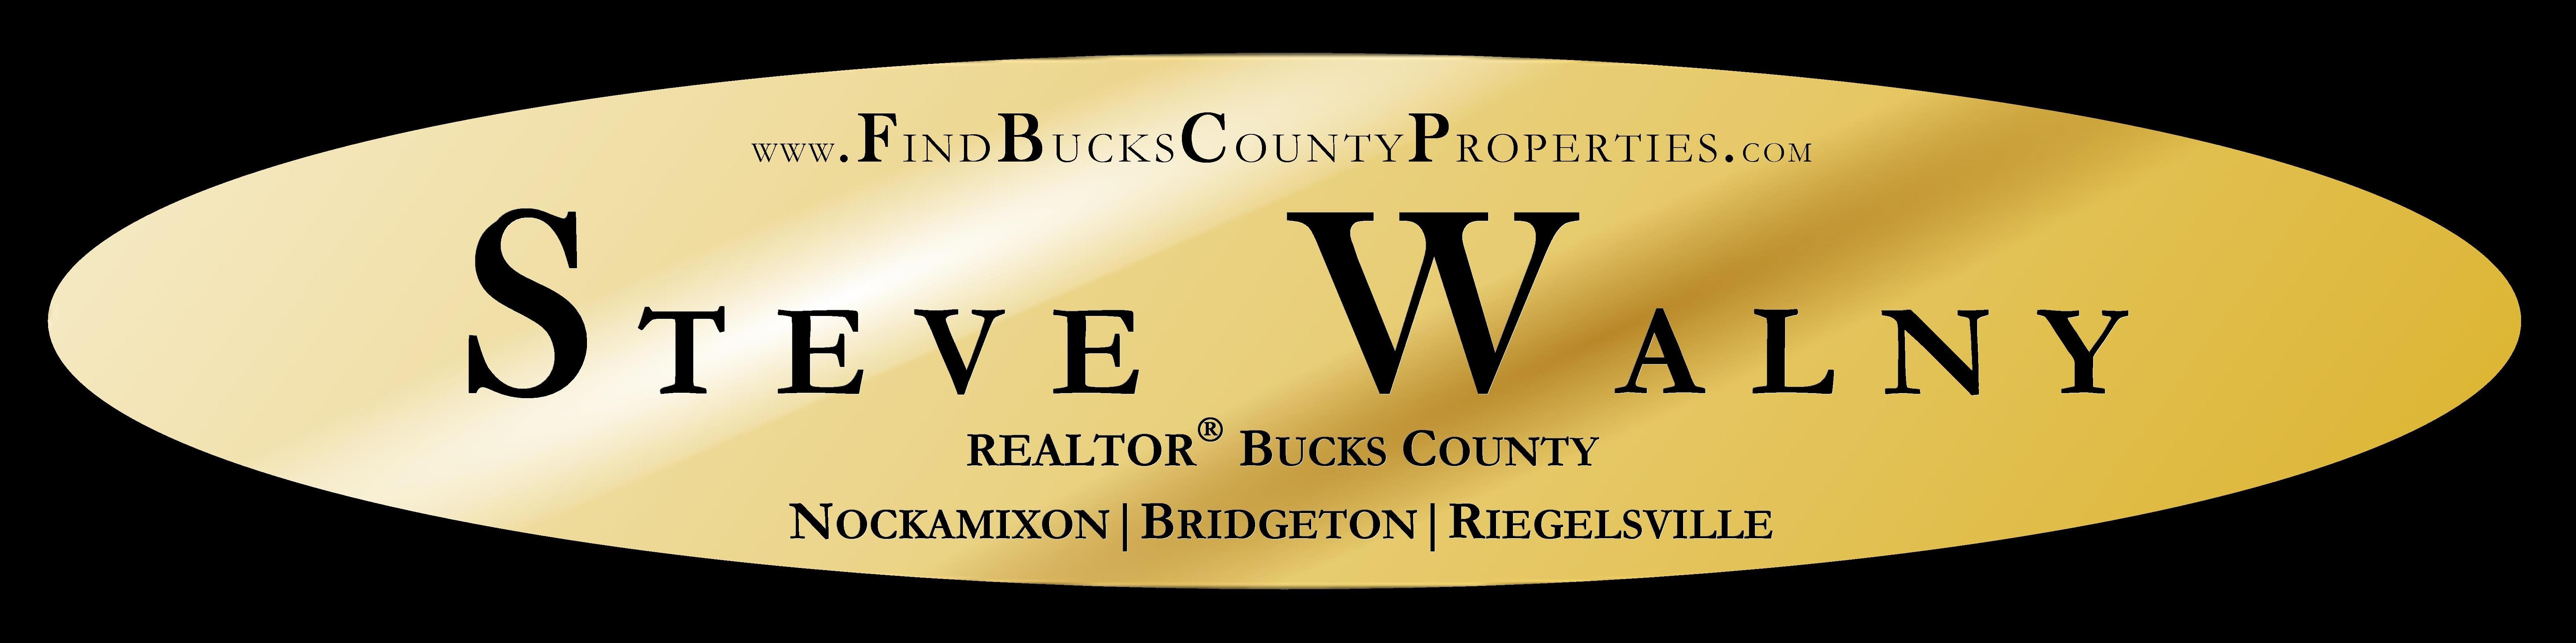 Steve Walny | #SteveWalny #BridgetonRealtor #BridgetonPAHomesForSale #BridgetonPA